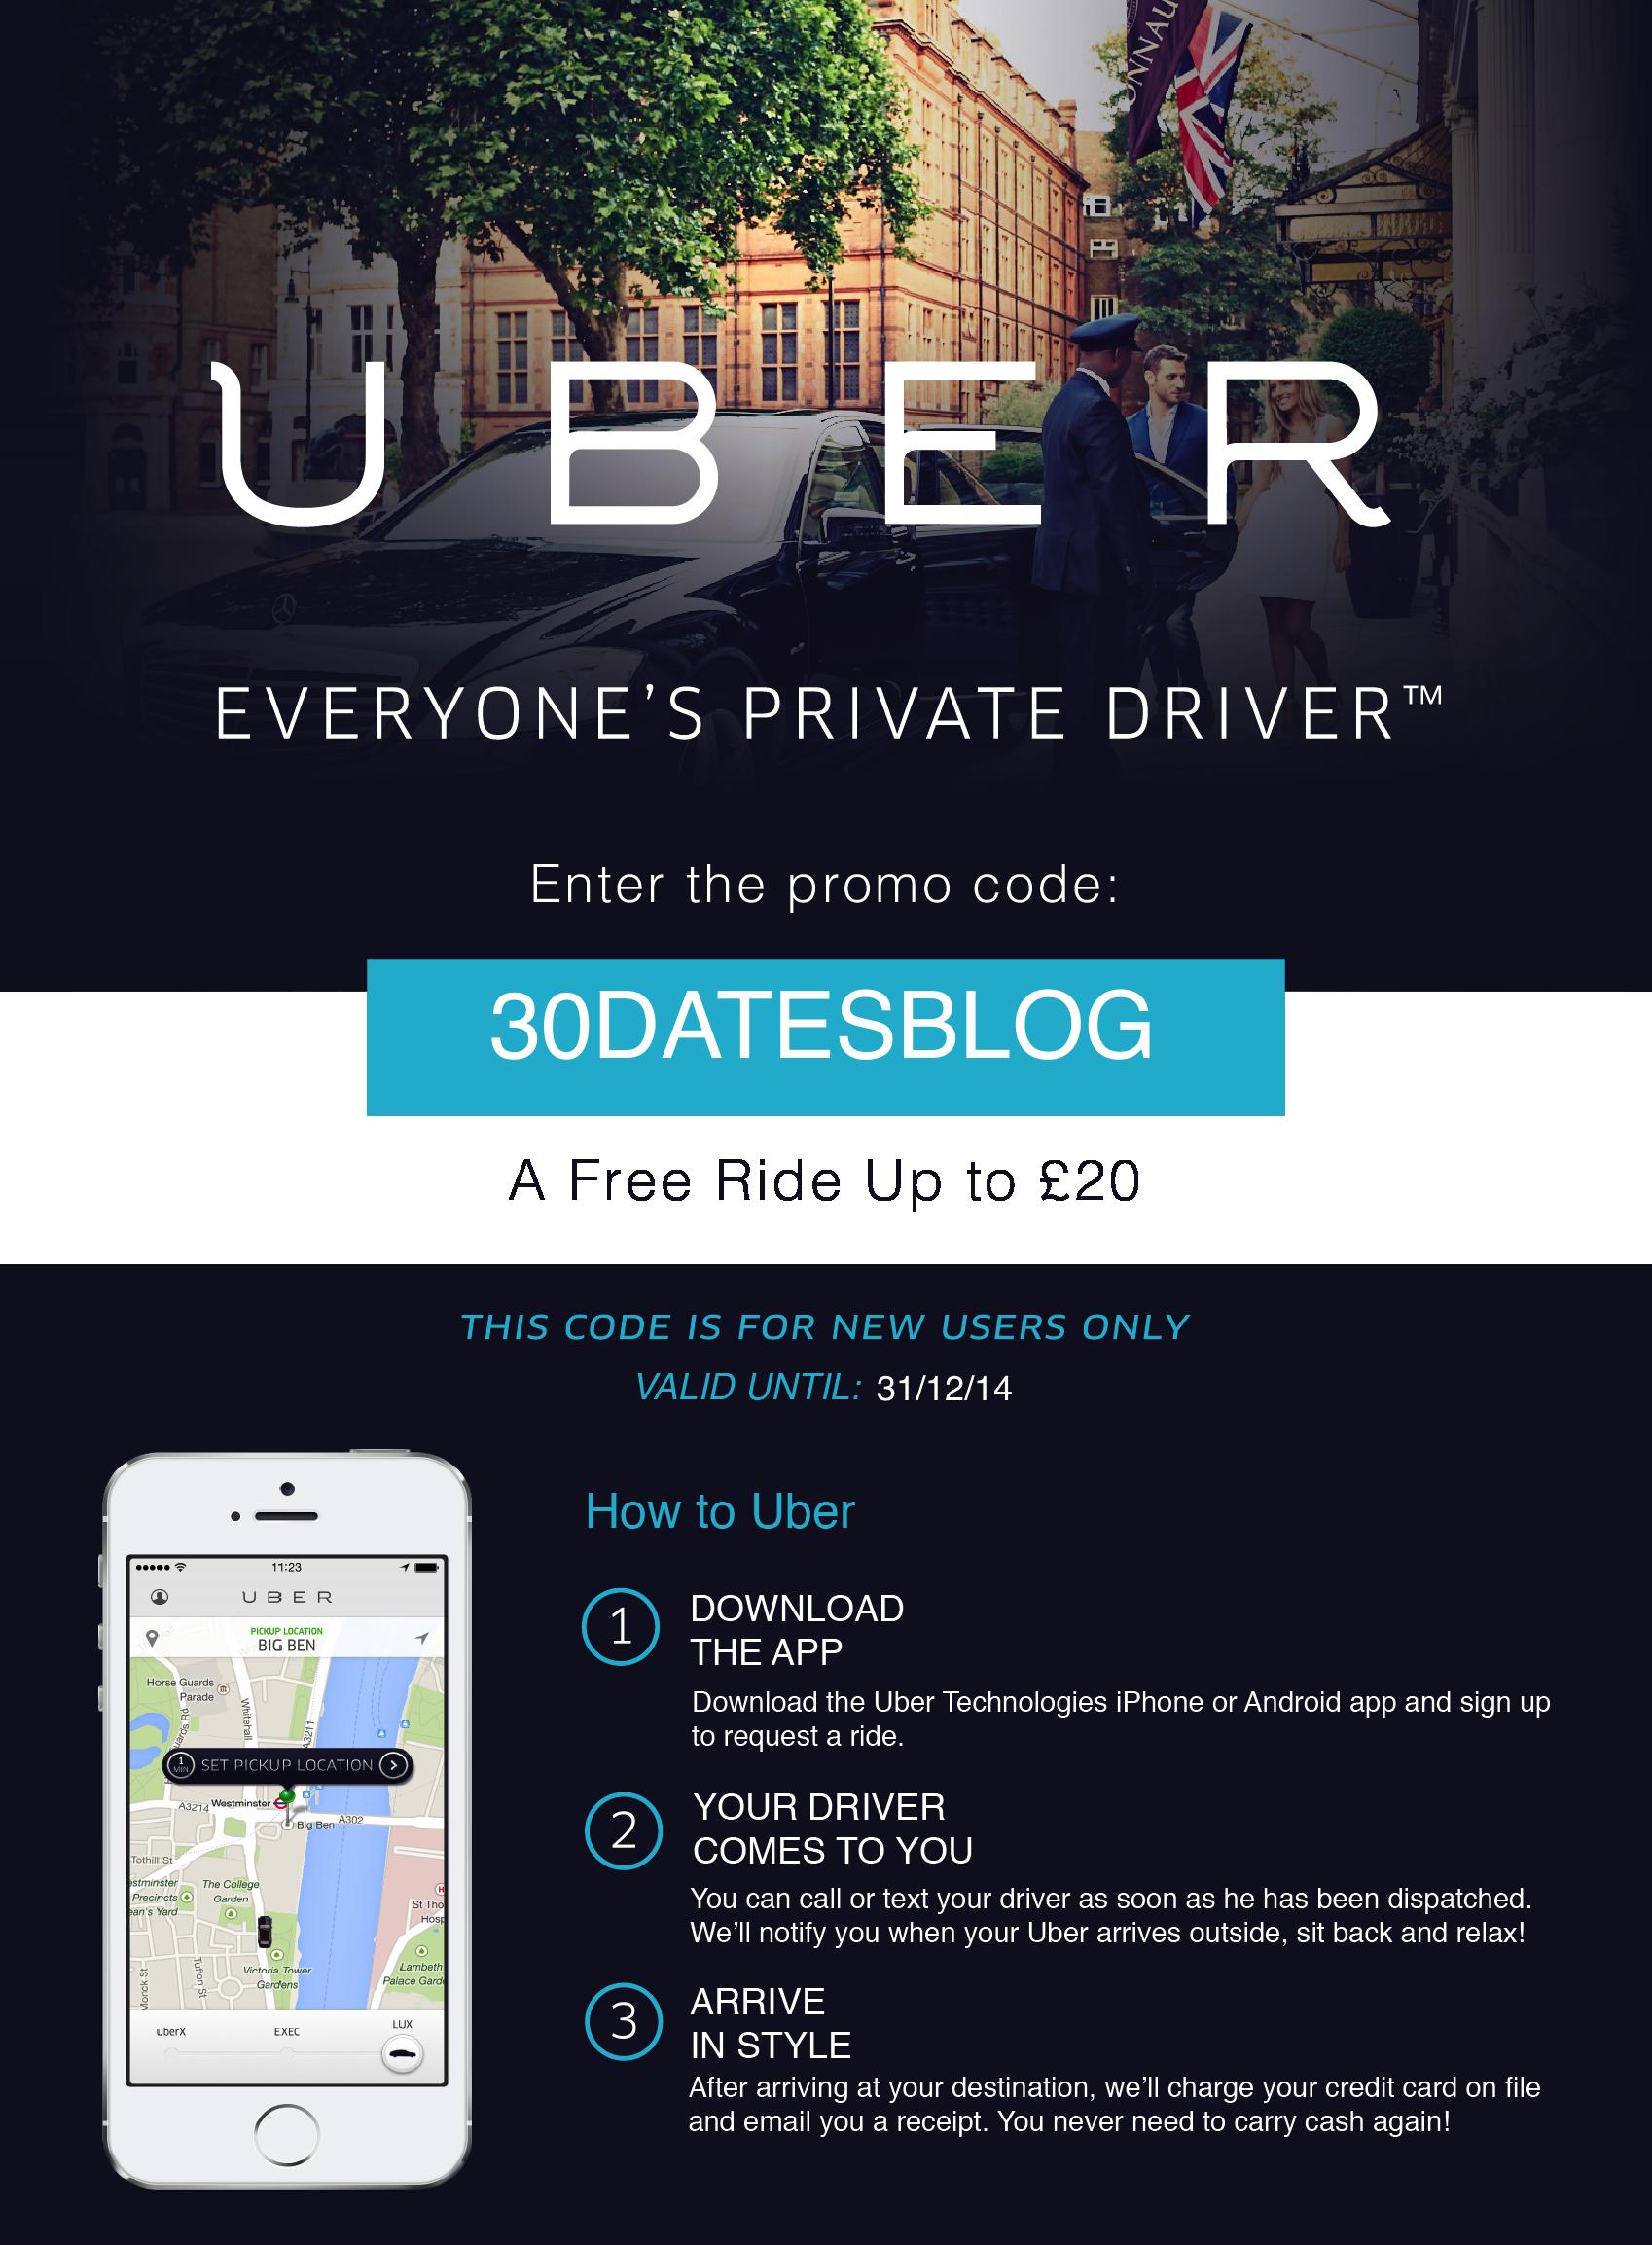 Uber dating